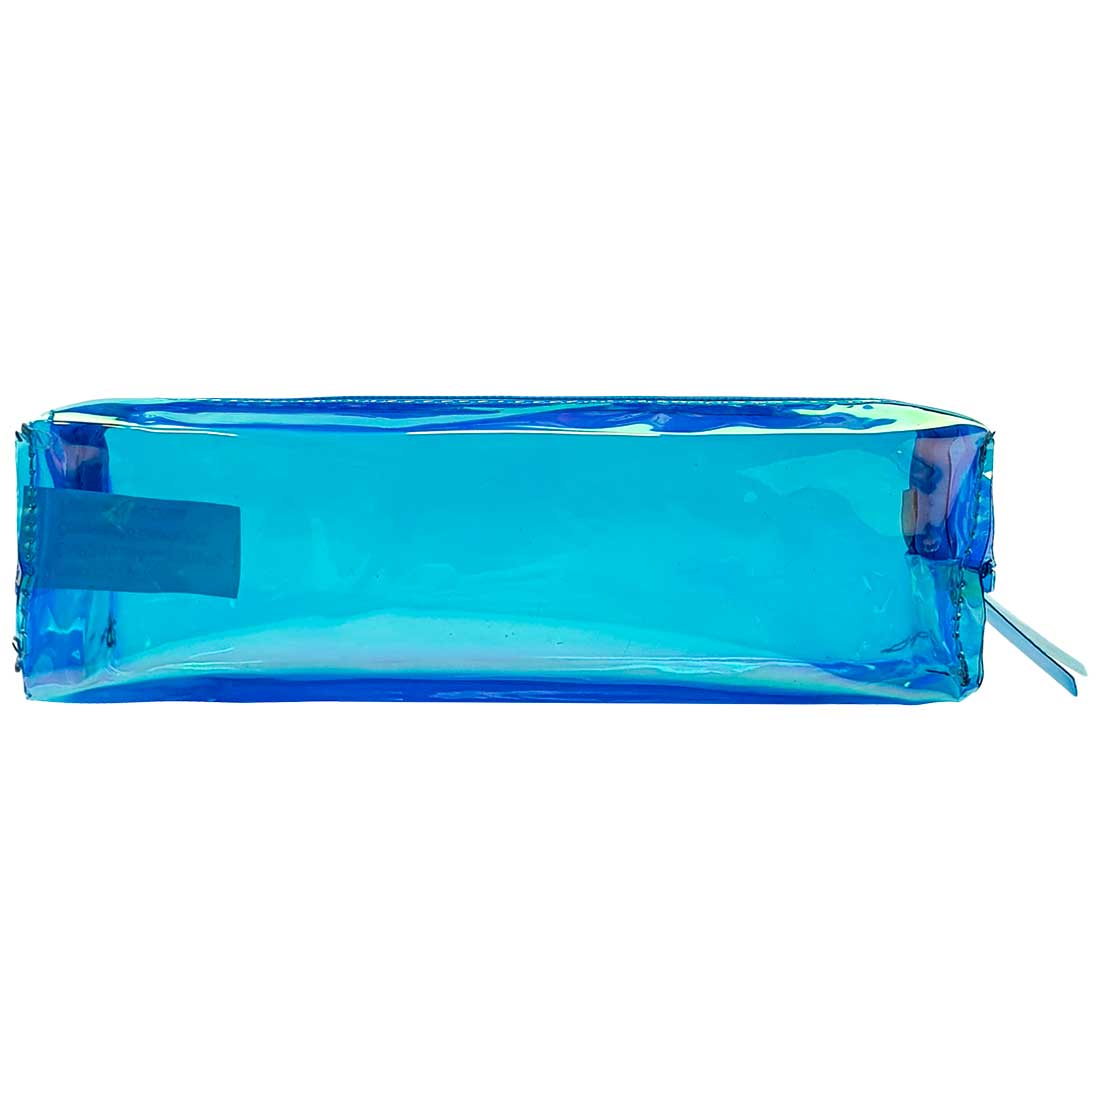 Estojo Transparente Holográfico - Azul